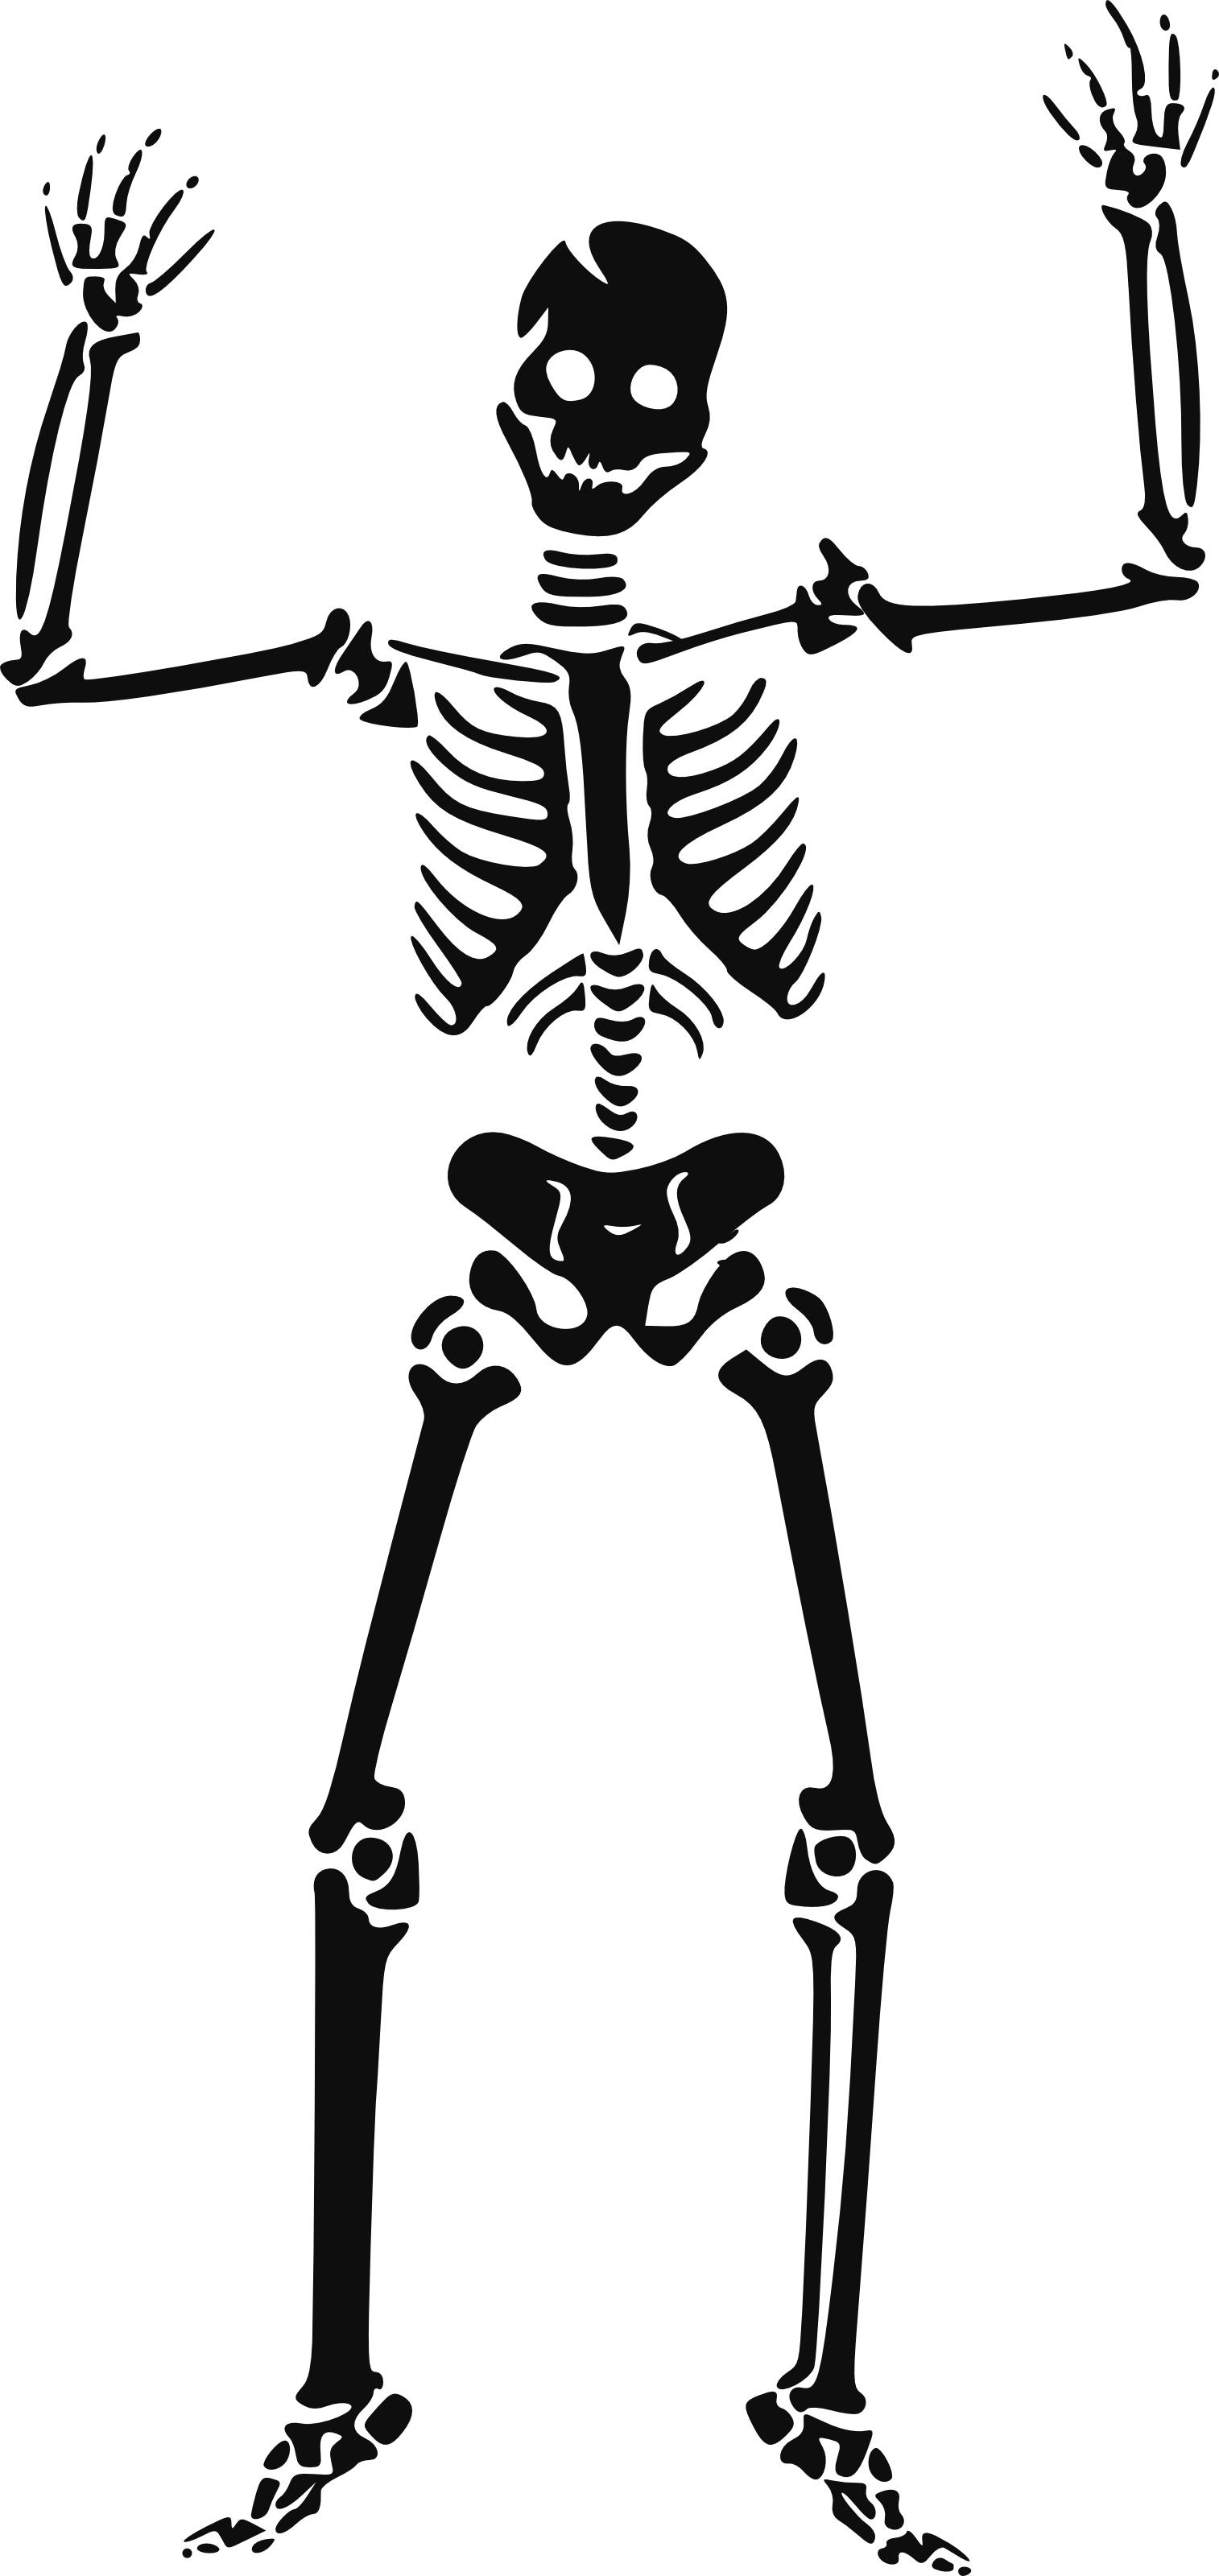 Skeleton clip art vector skeleton graphics image.